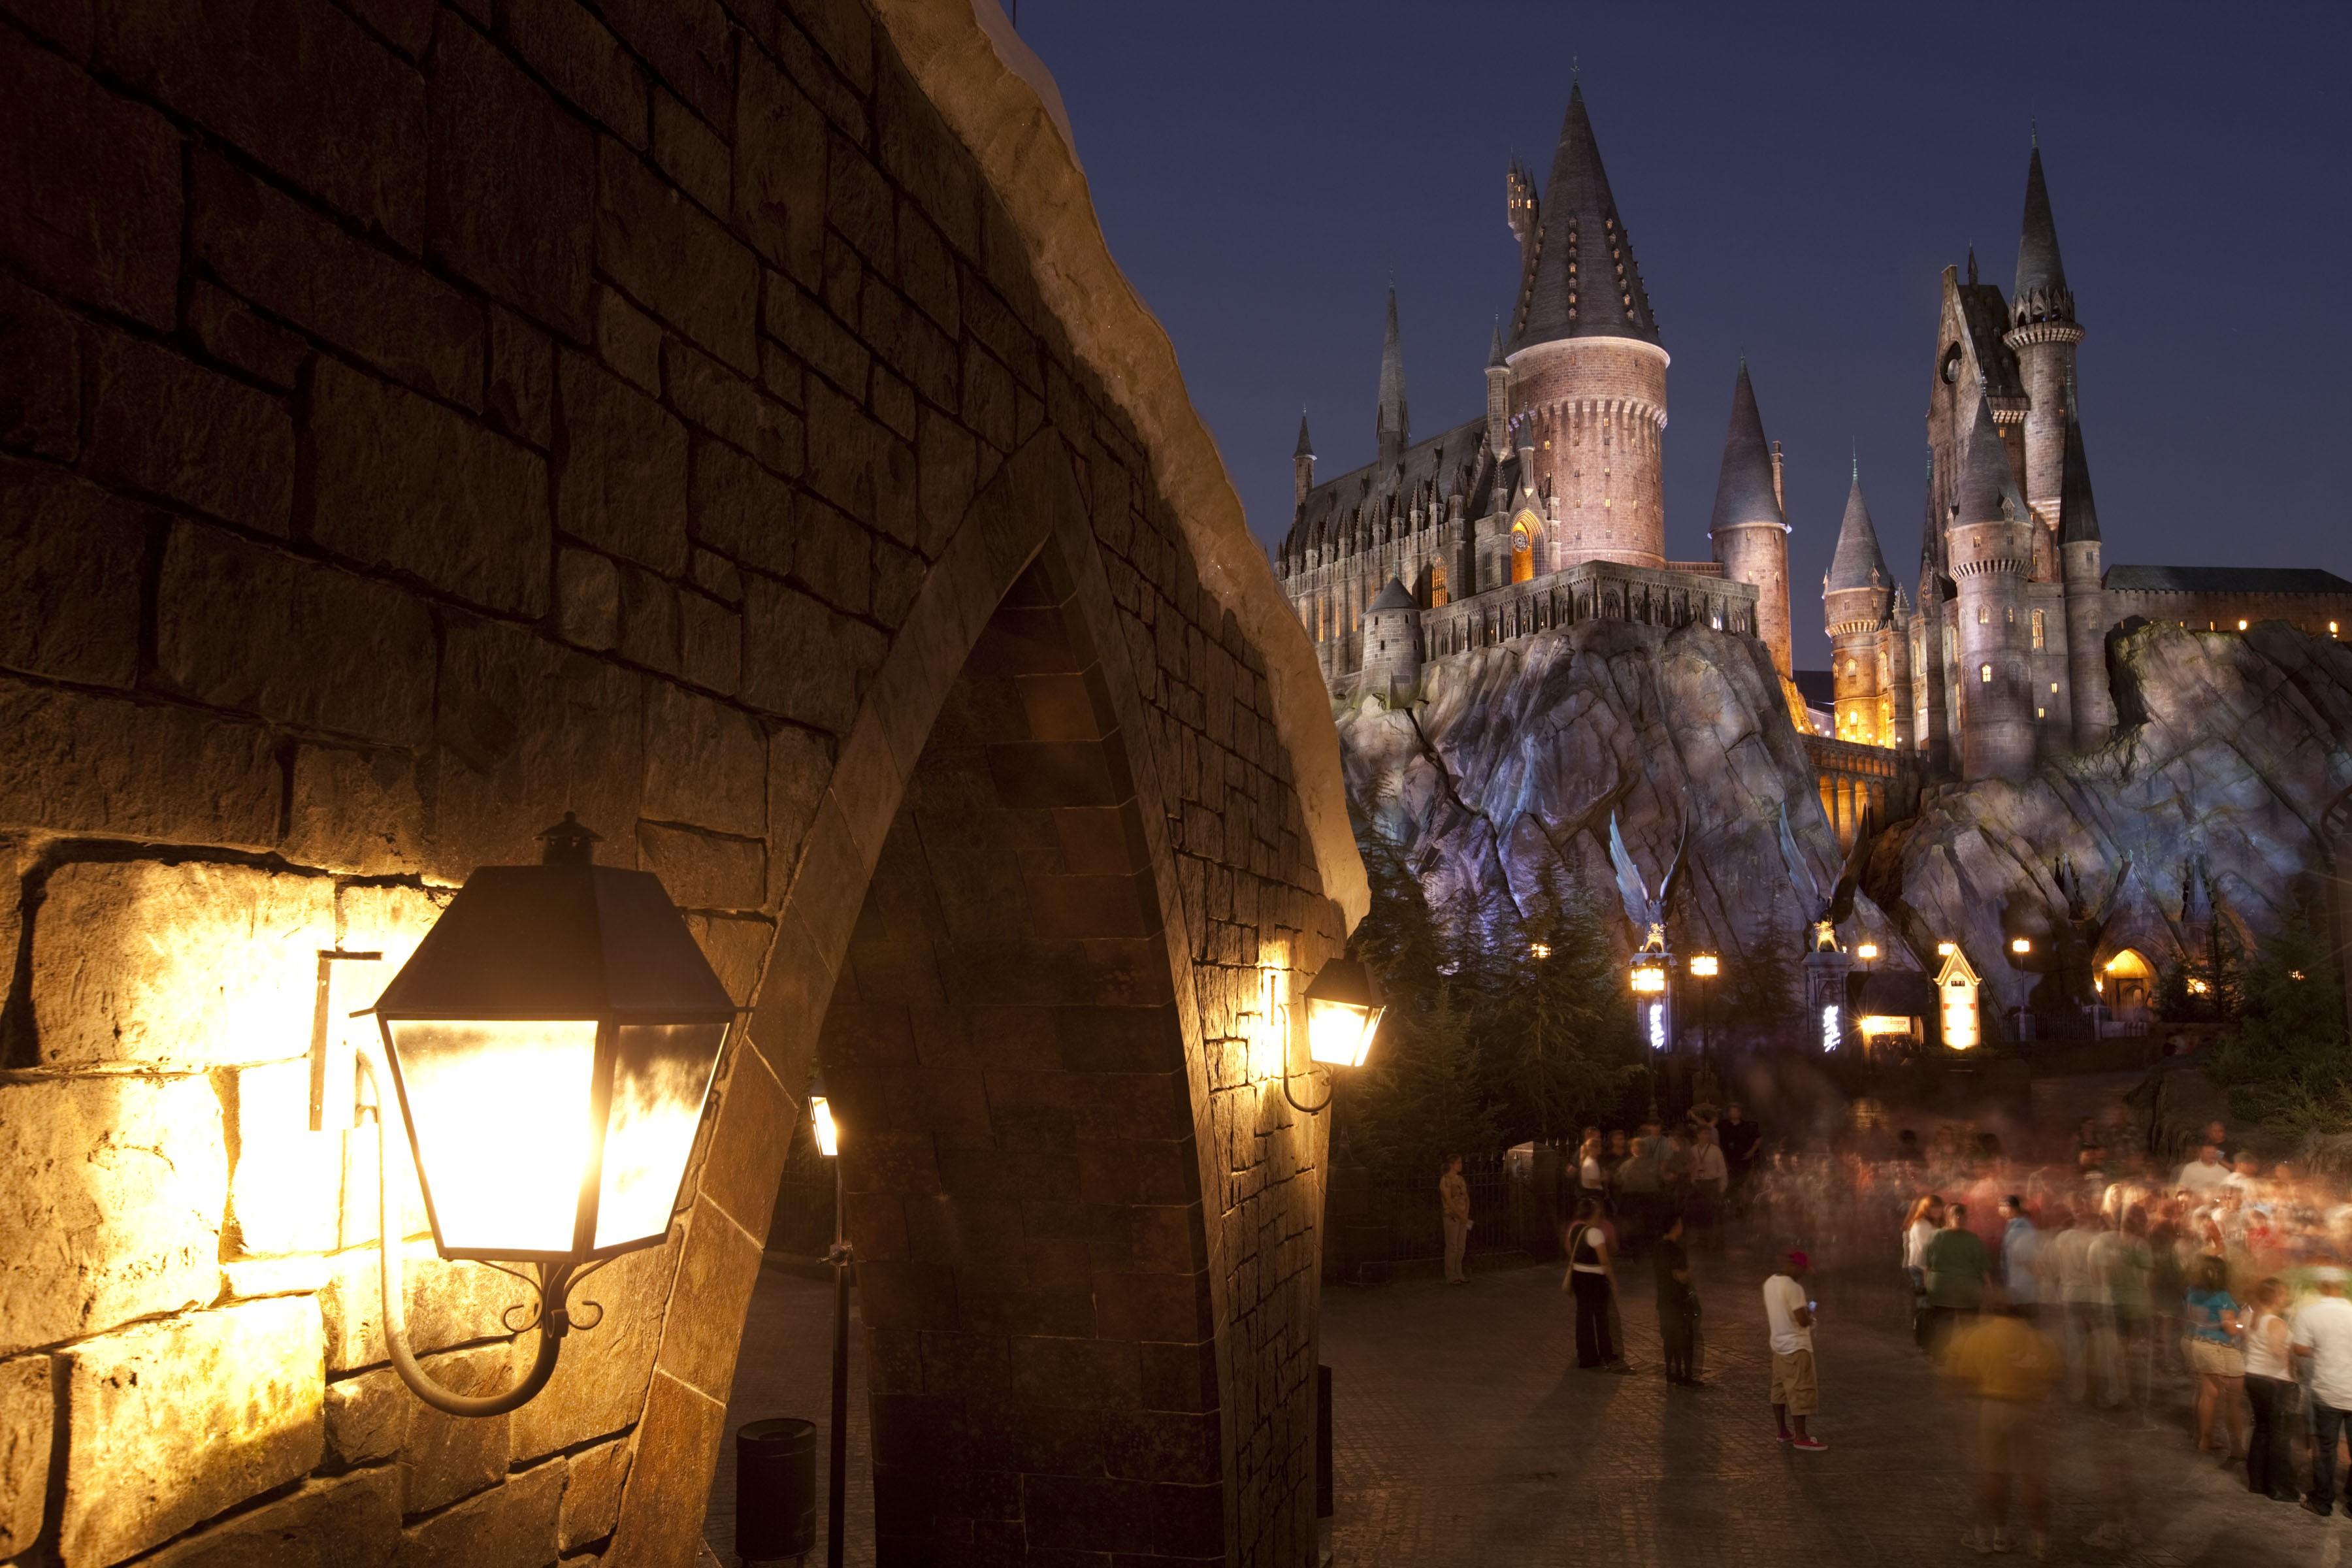 Hogwarts Desktop Background Posted By Samantha Simpson